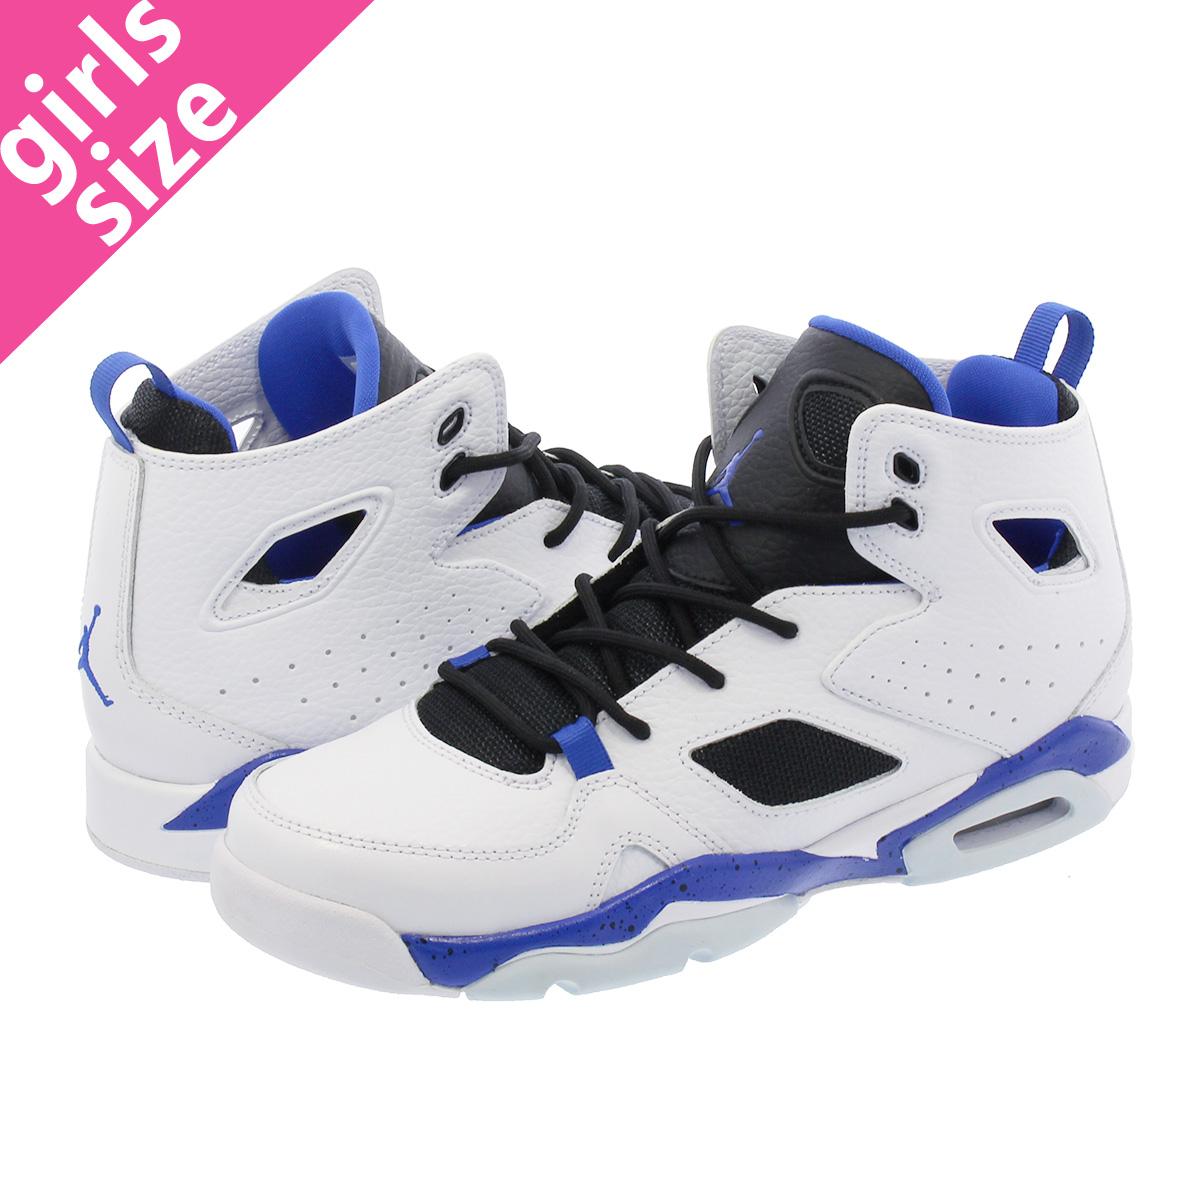 outlet store c0879 29495 NIKE JORDAN FLIGHT CLUB 91 BG Nike Jordan flight club 91 BG WHITE/HYPER  ROYAL/BLACK 555,472-100